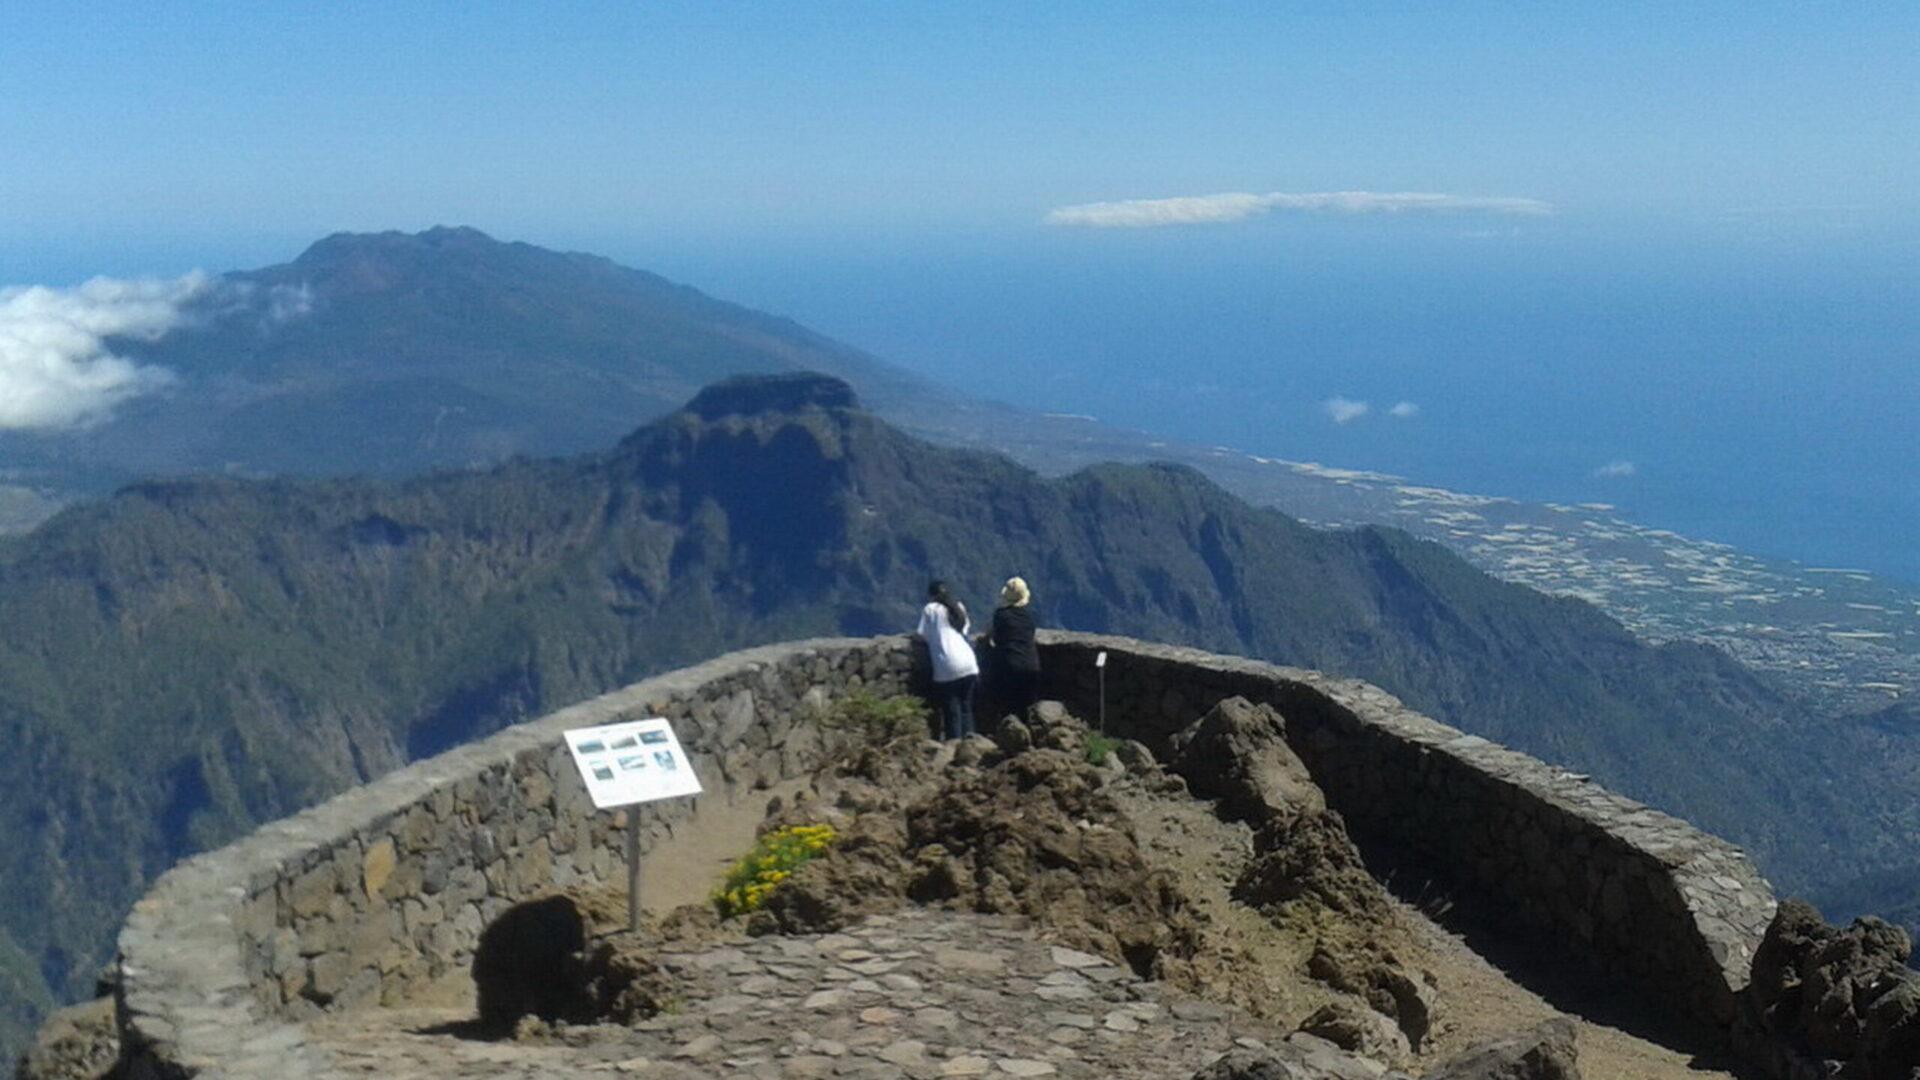 Exc. La Palma Spezial Viajes Pamir (2) Inselgipfel Roque Muchachos